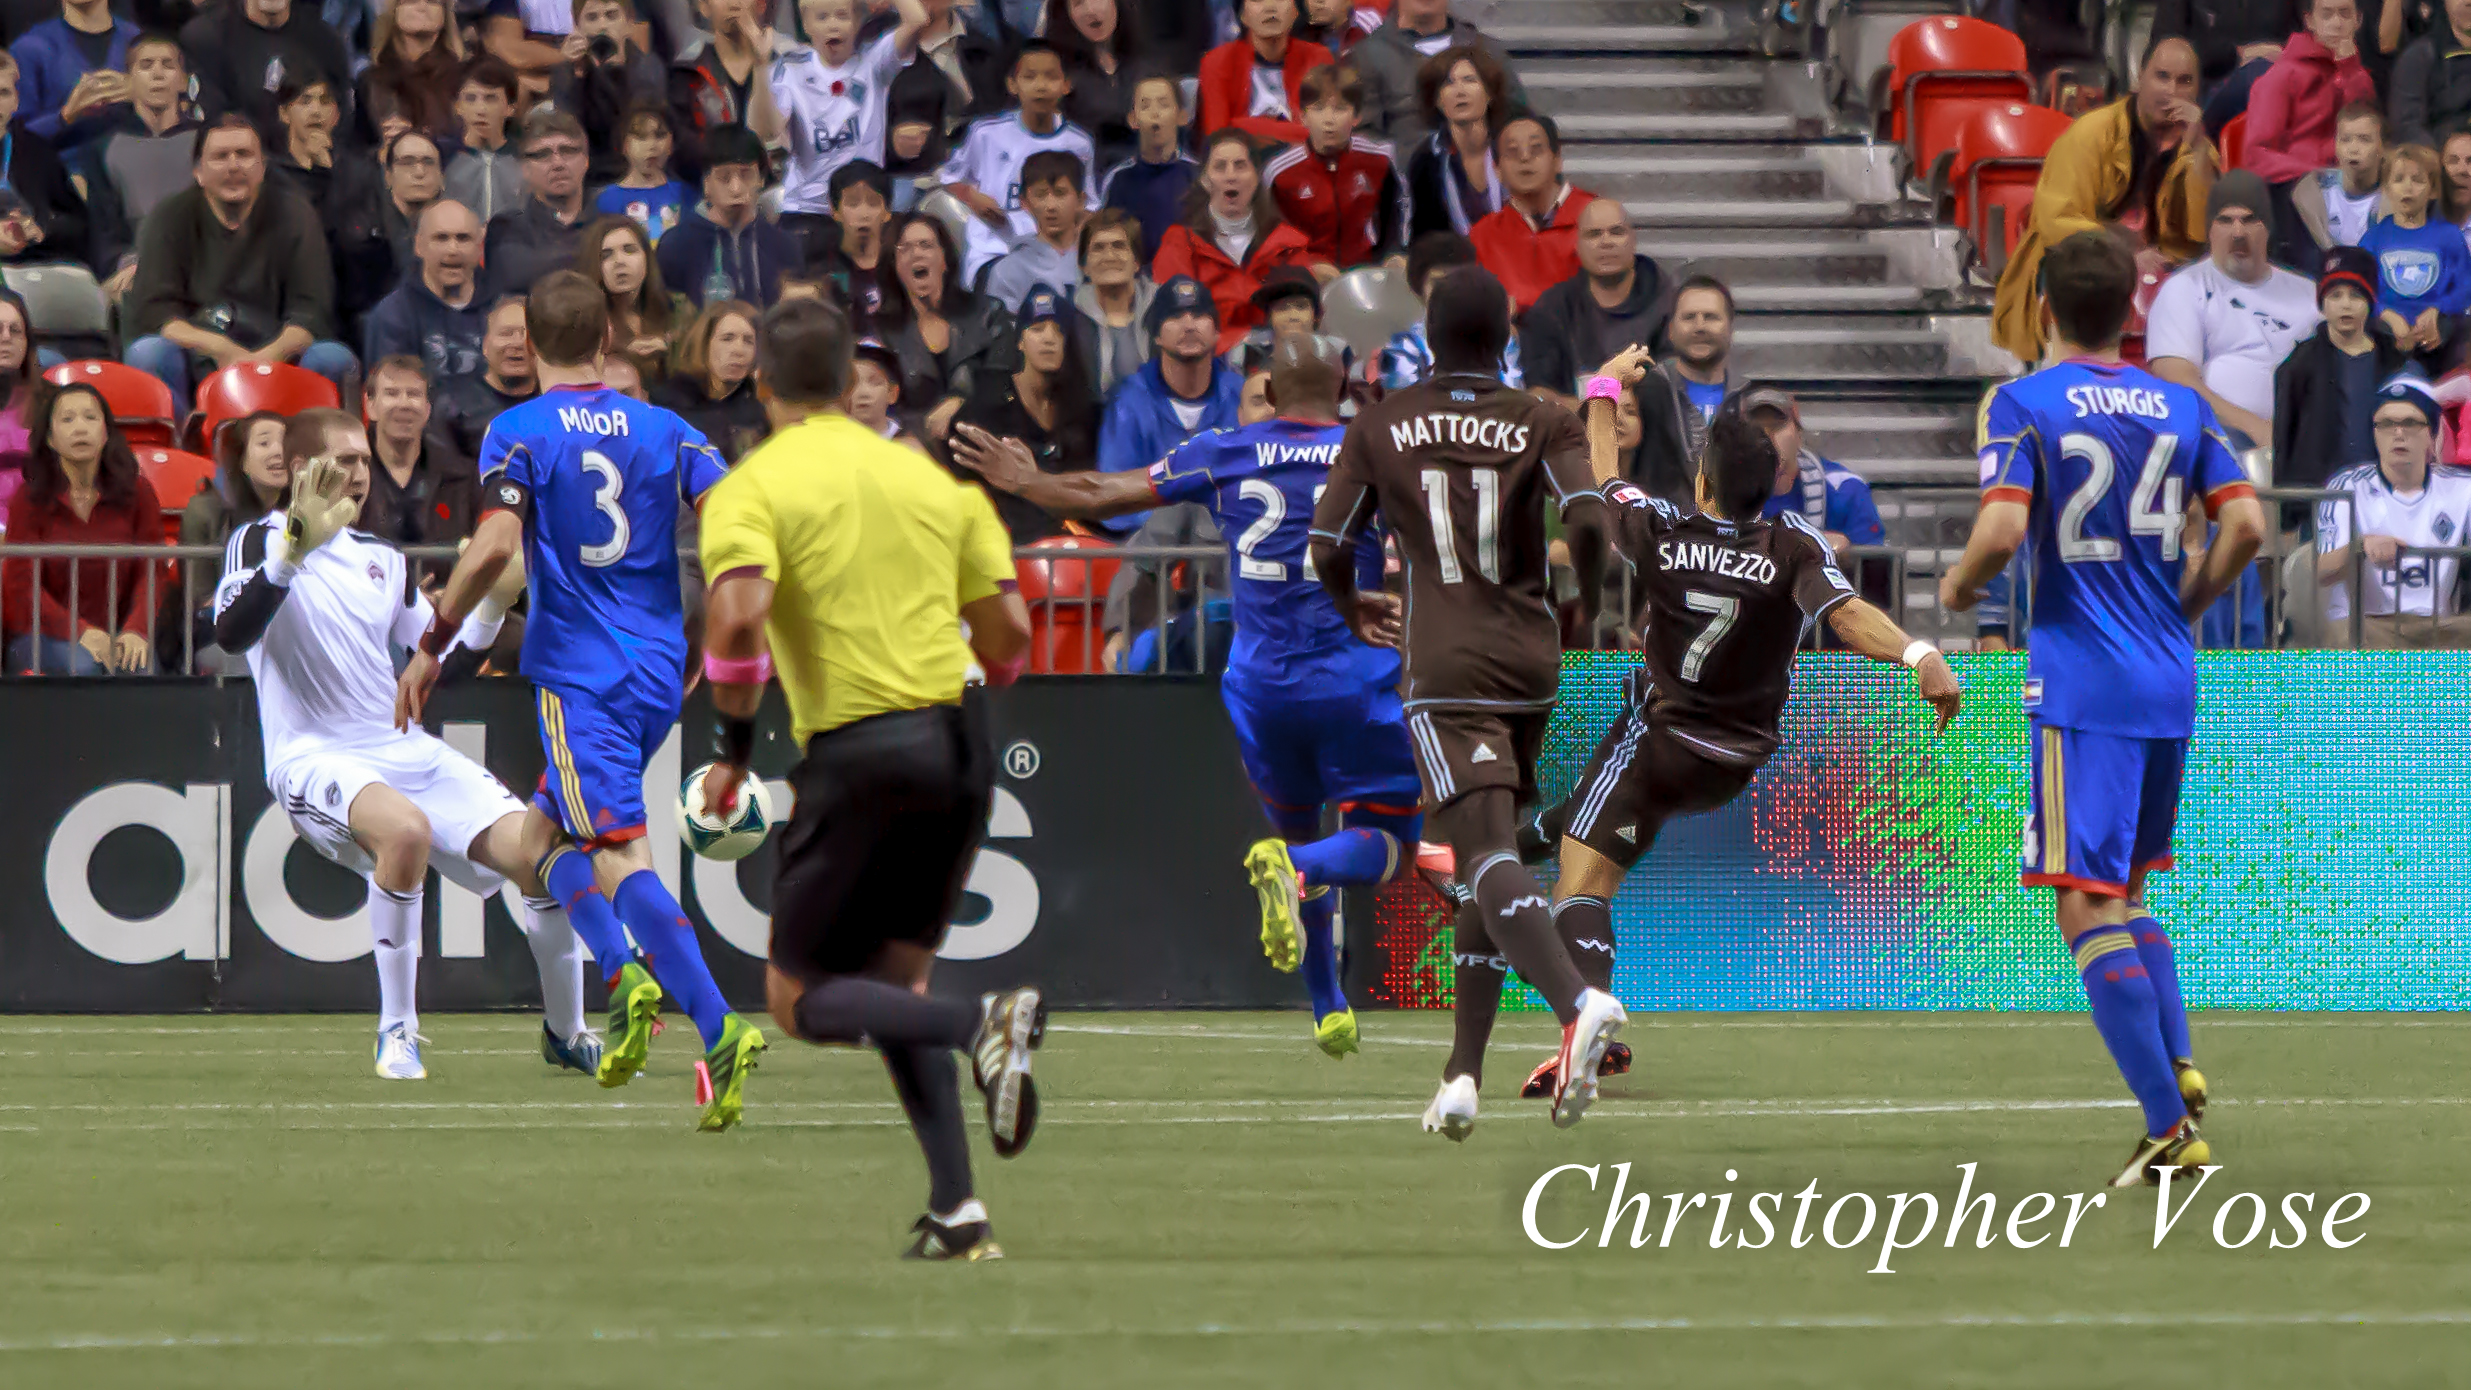 2013-10-27 Camilo Sanvezzo's Third Goal.jpg